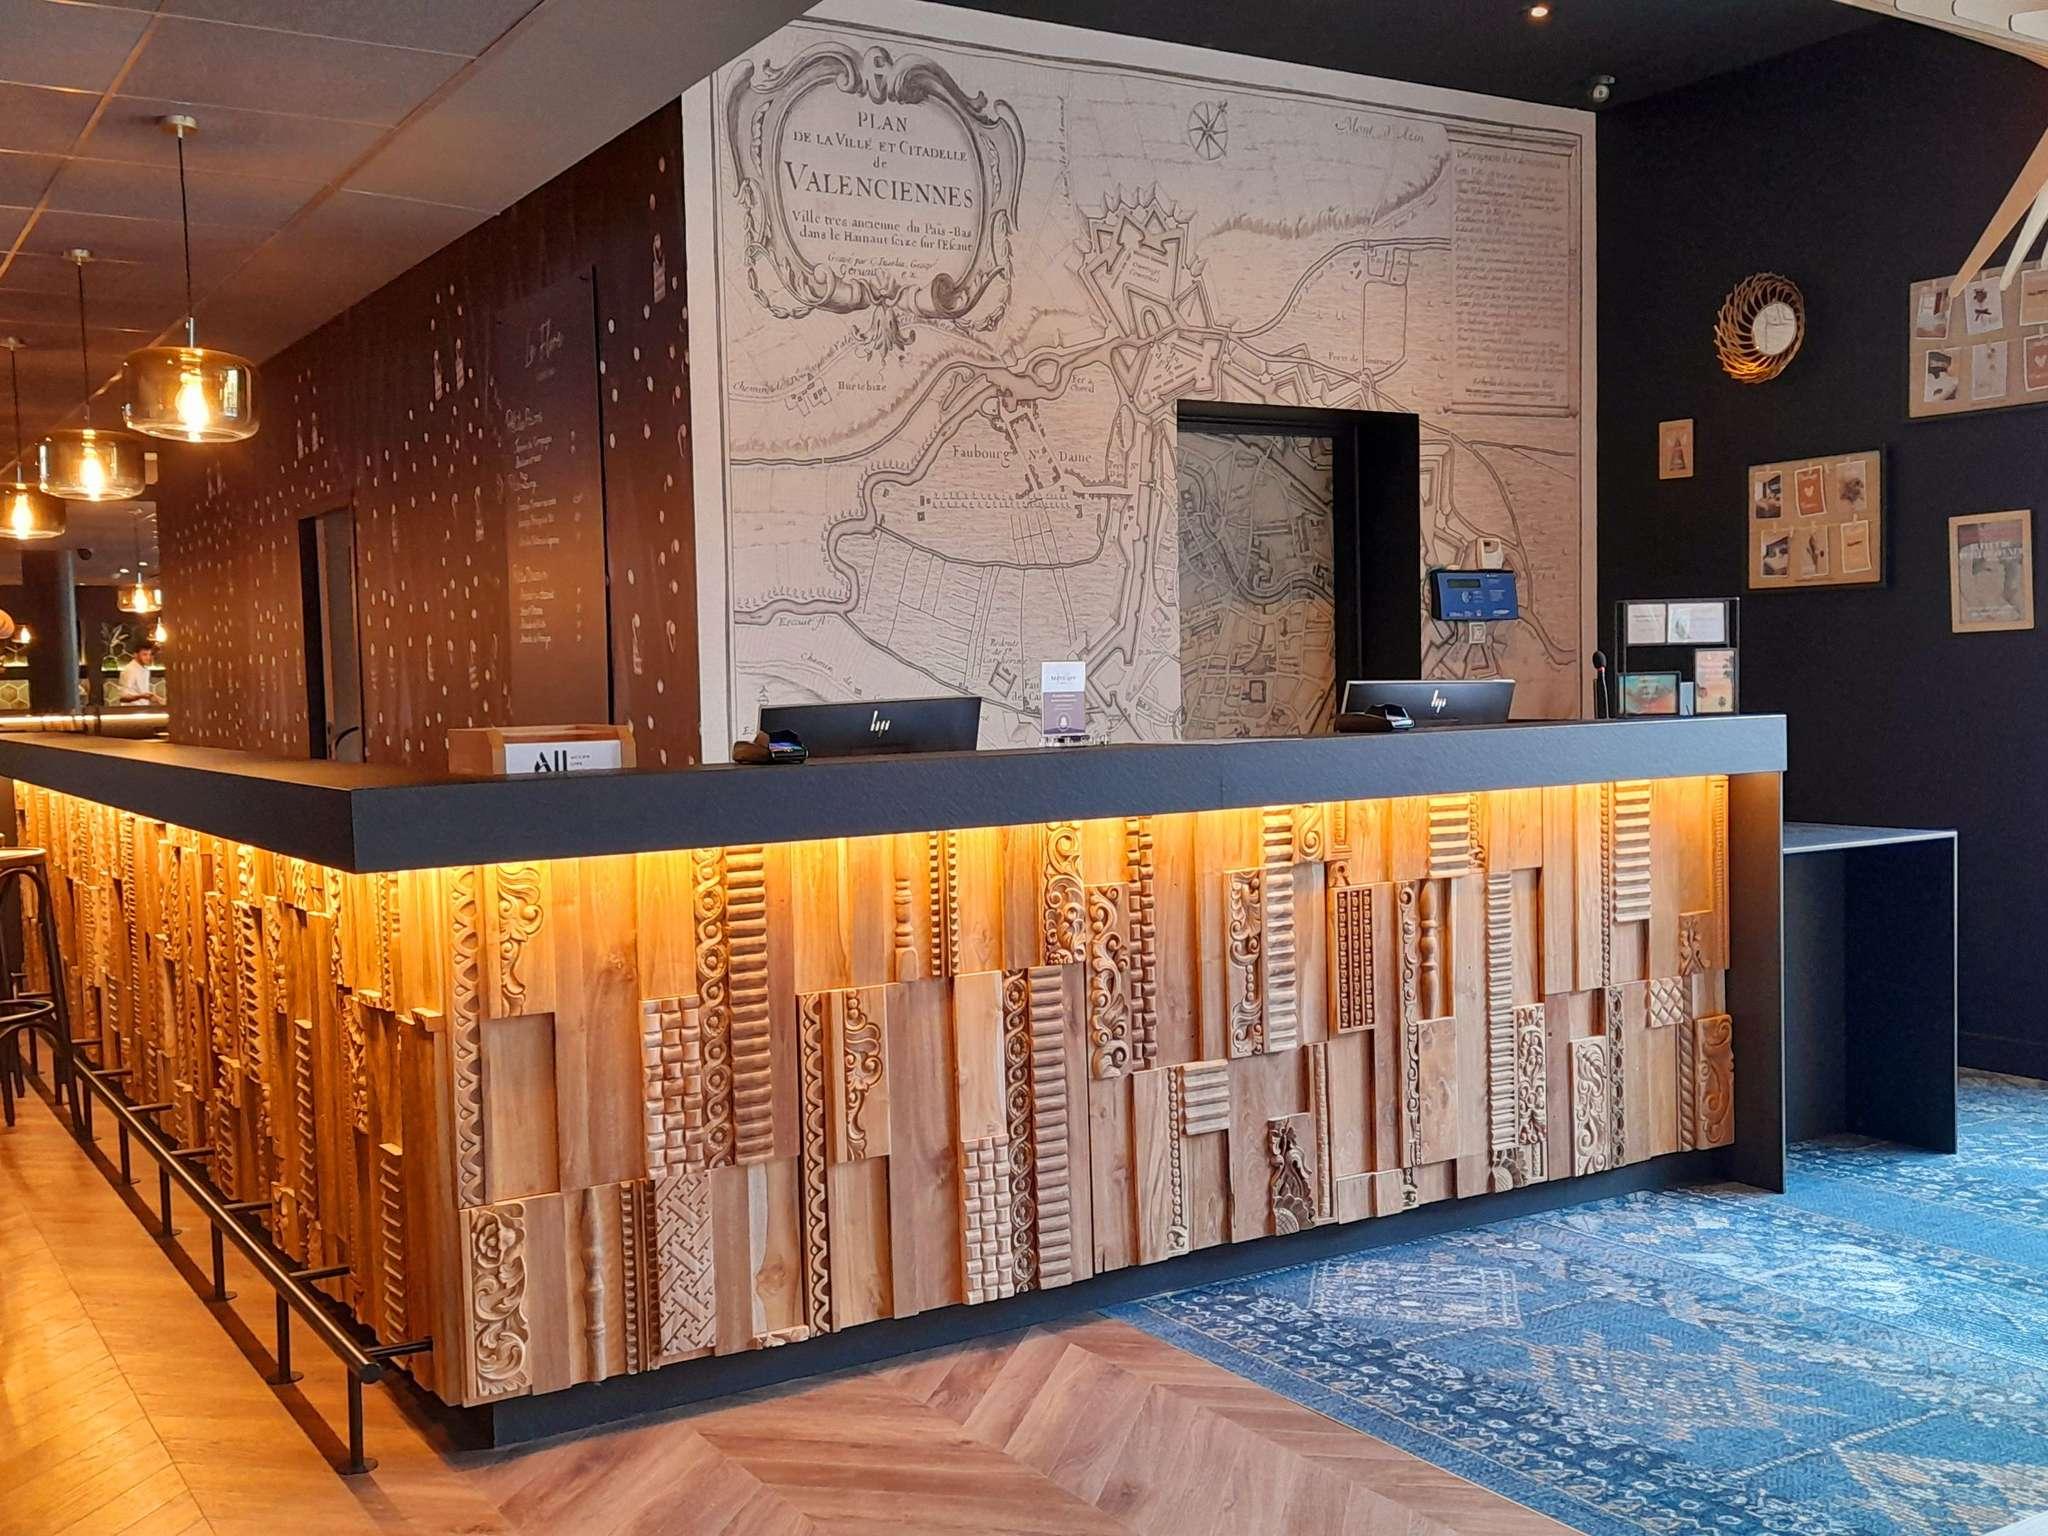 Отель — Hôtel Mercure Valenciennes Centre